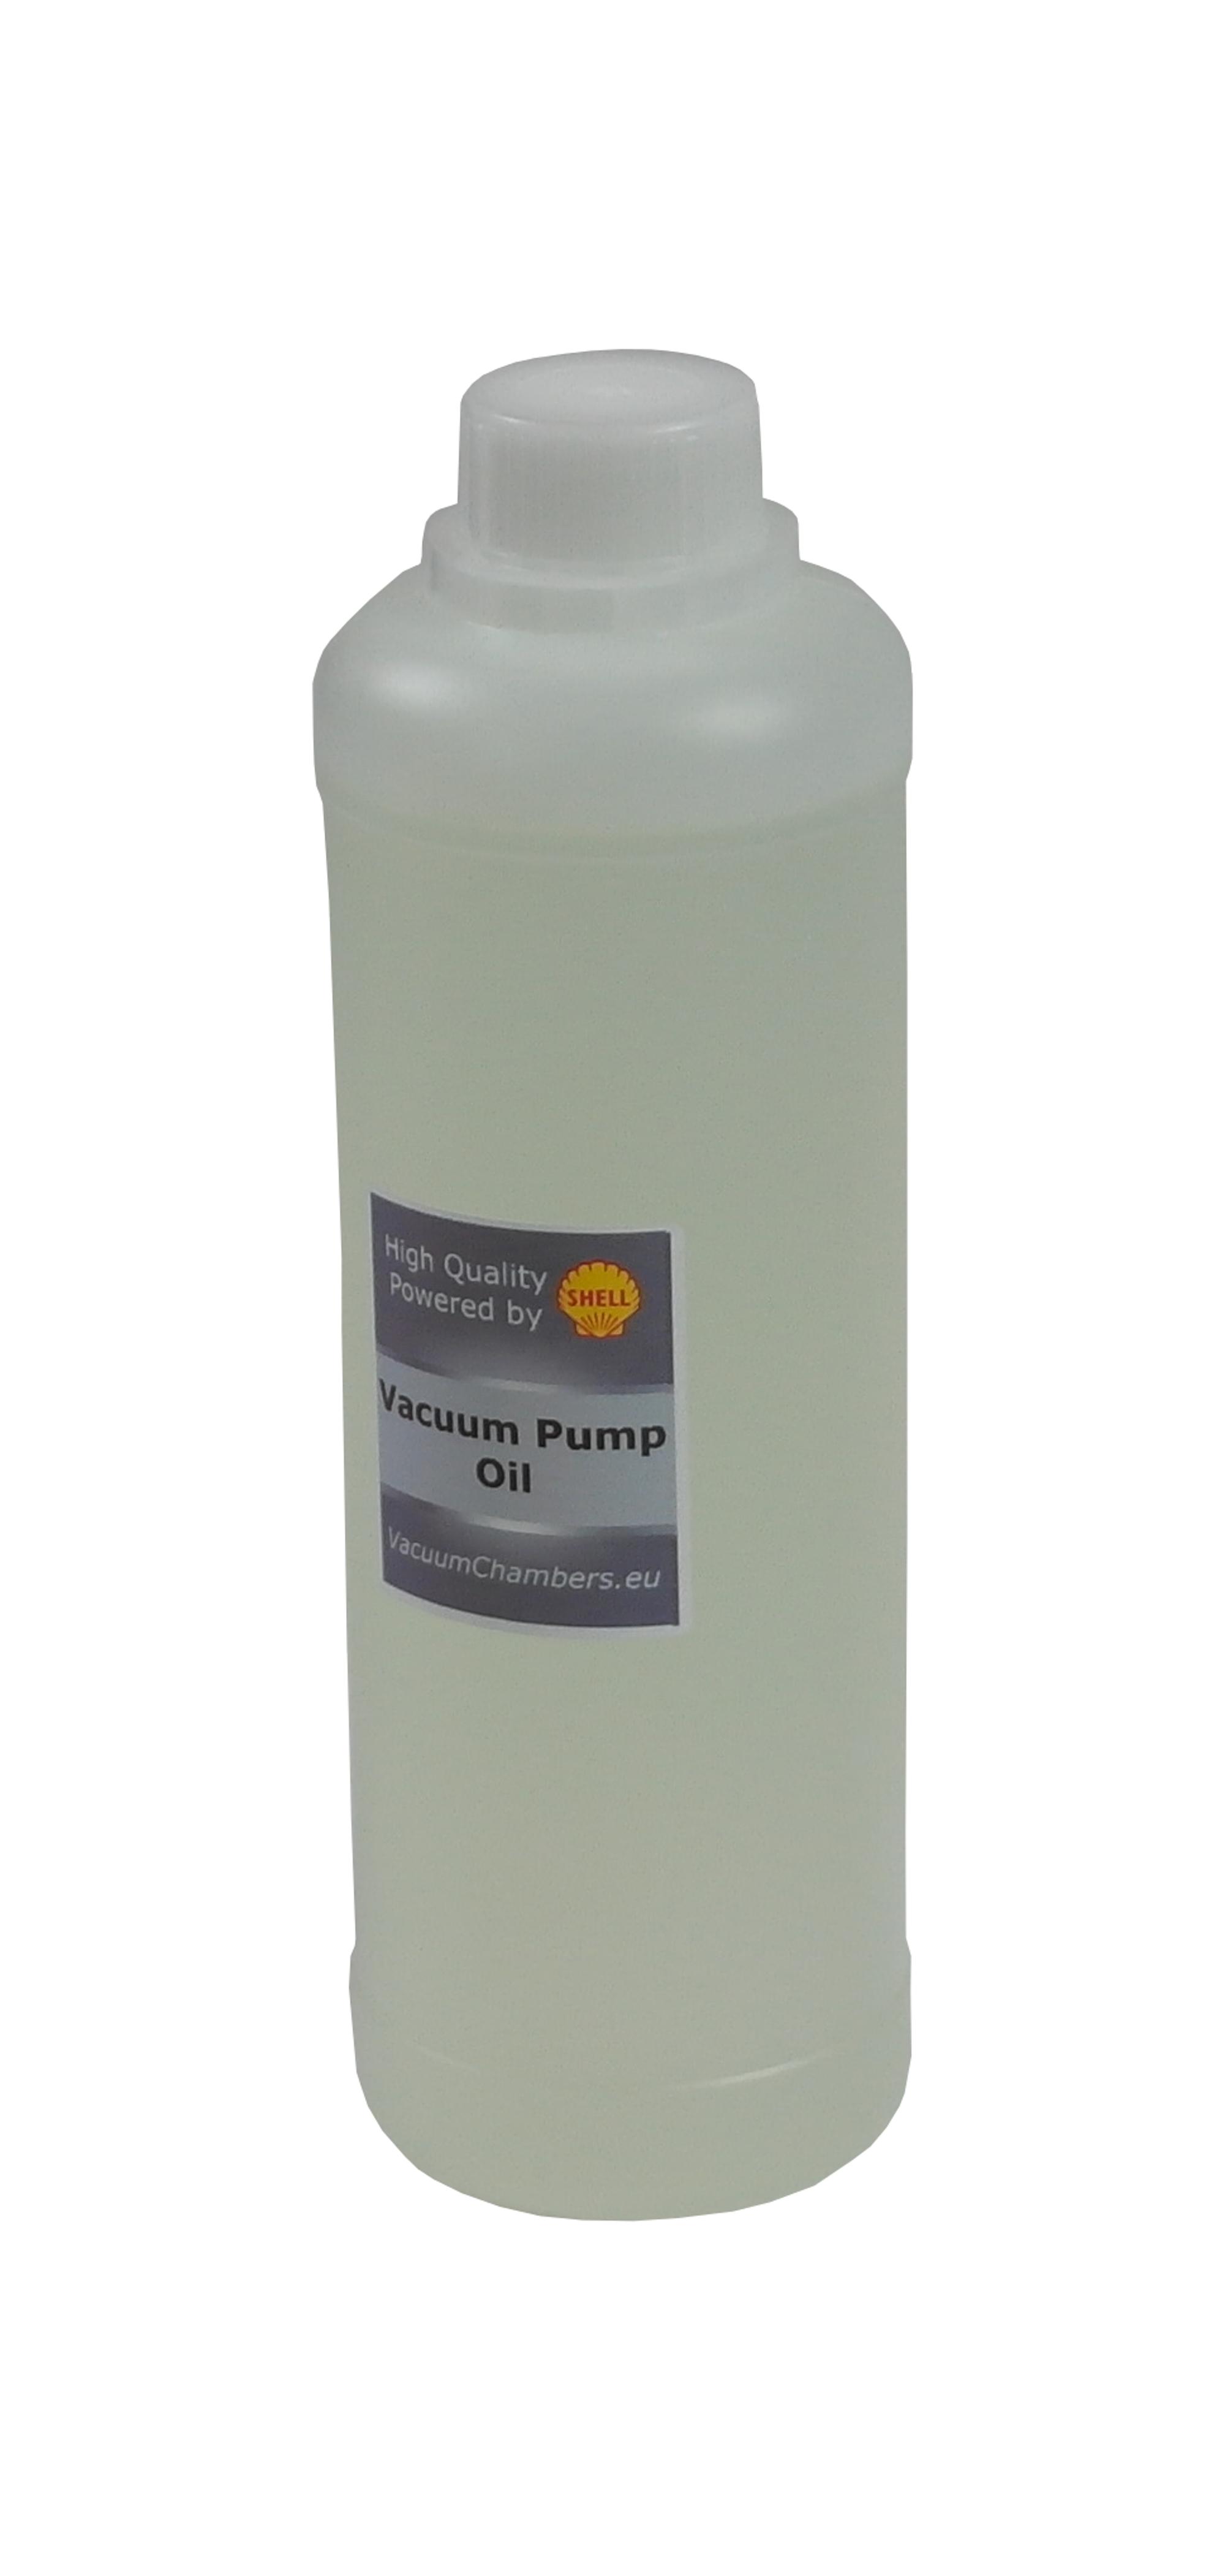 Vacuum Pump Oil | Best Upcoming Car Release